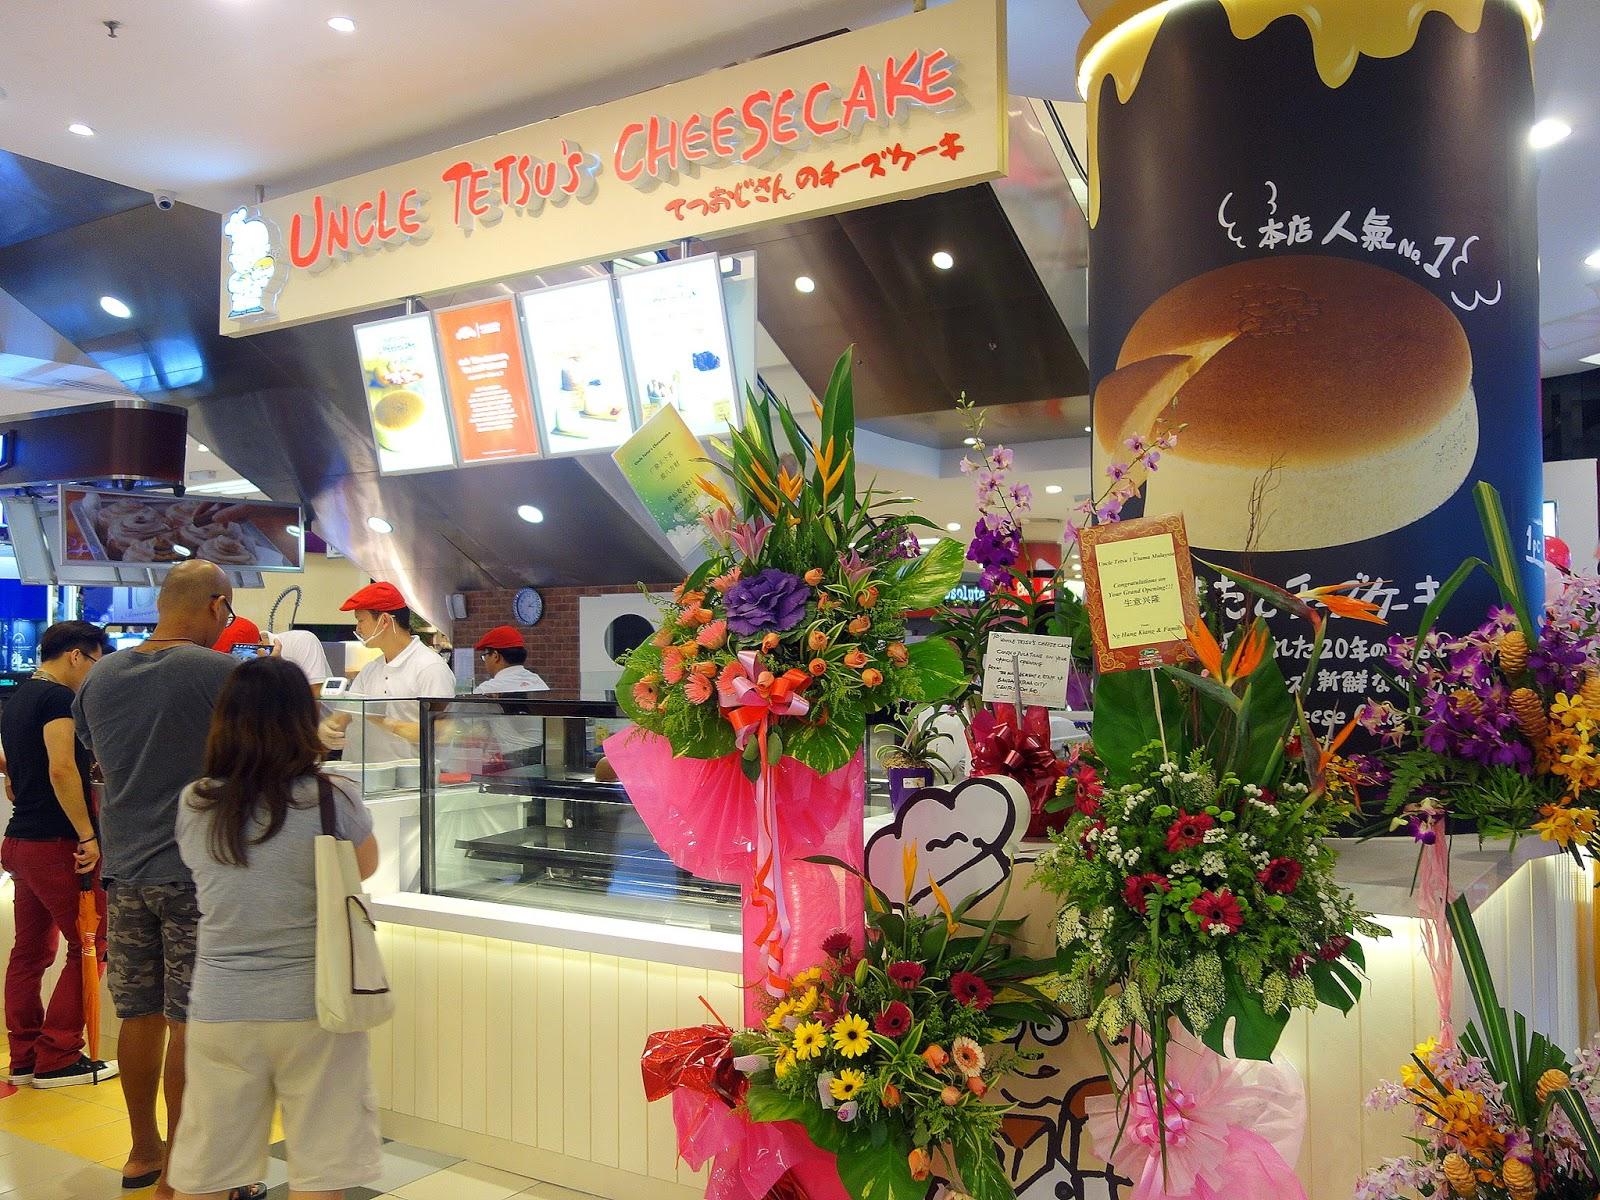 uncle tetsu's cheesecake @ 1 utama & ow:l espresso @ ss15 subang